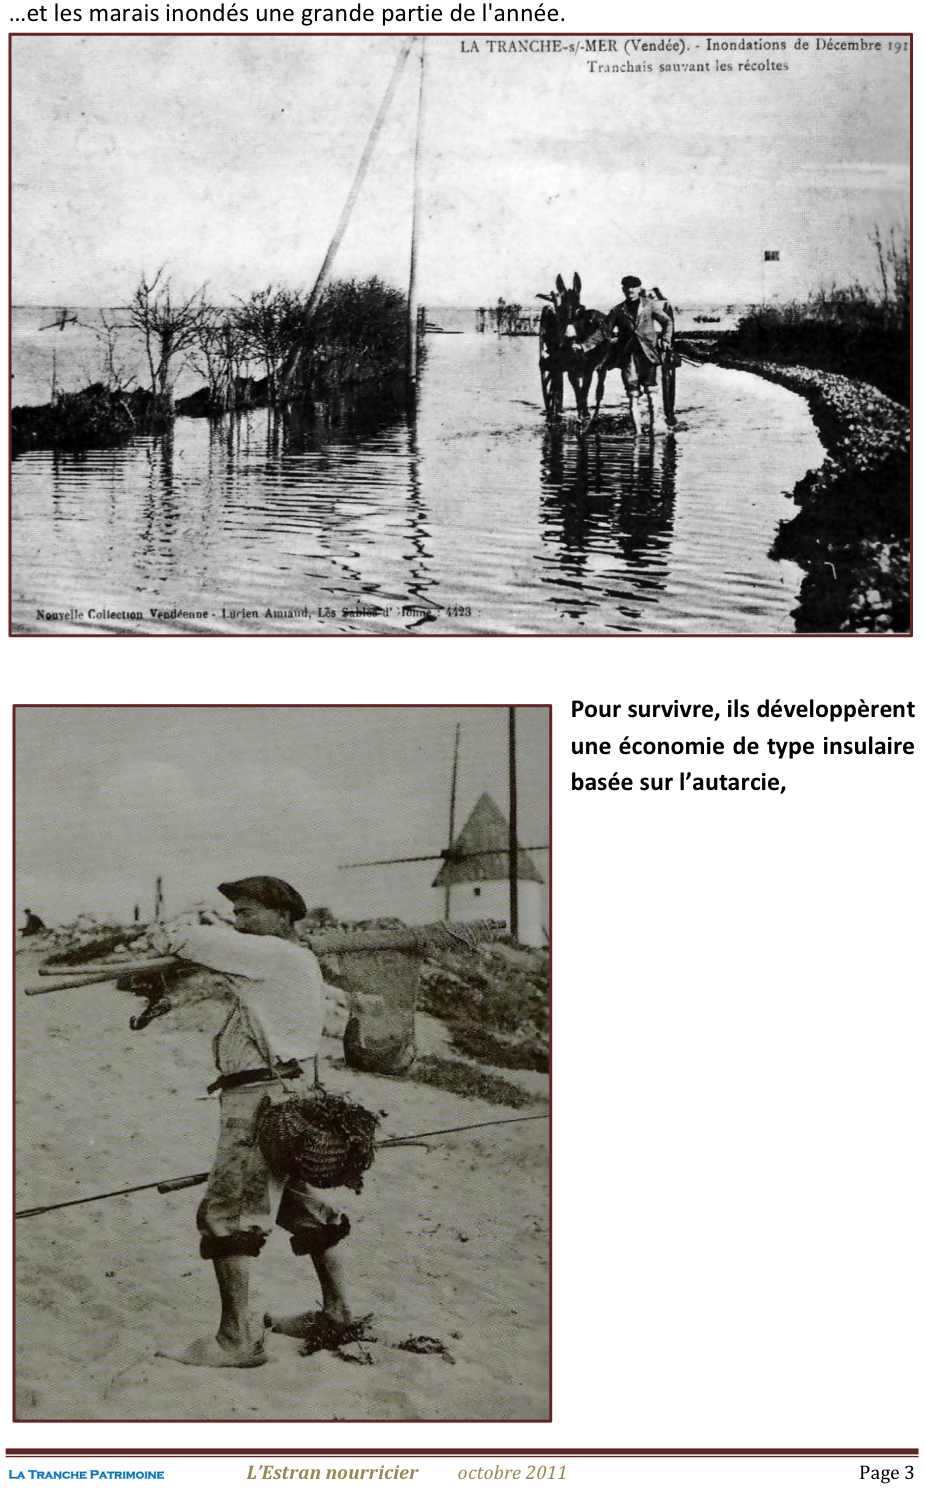 Lestran Nourricier 3 jpeg1.jpg